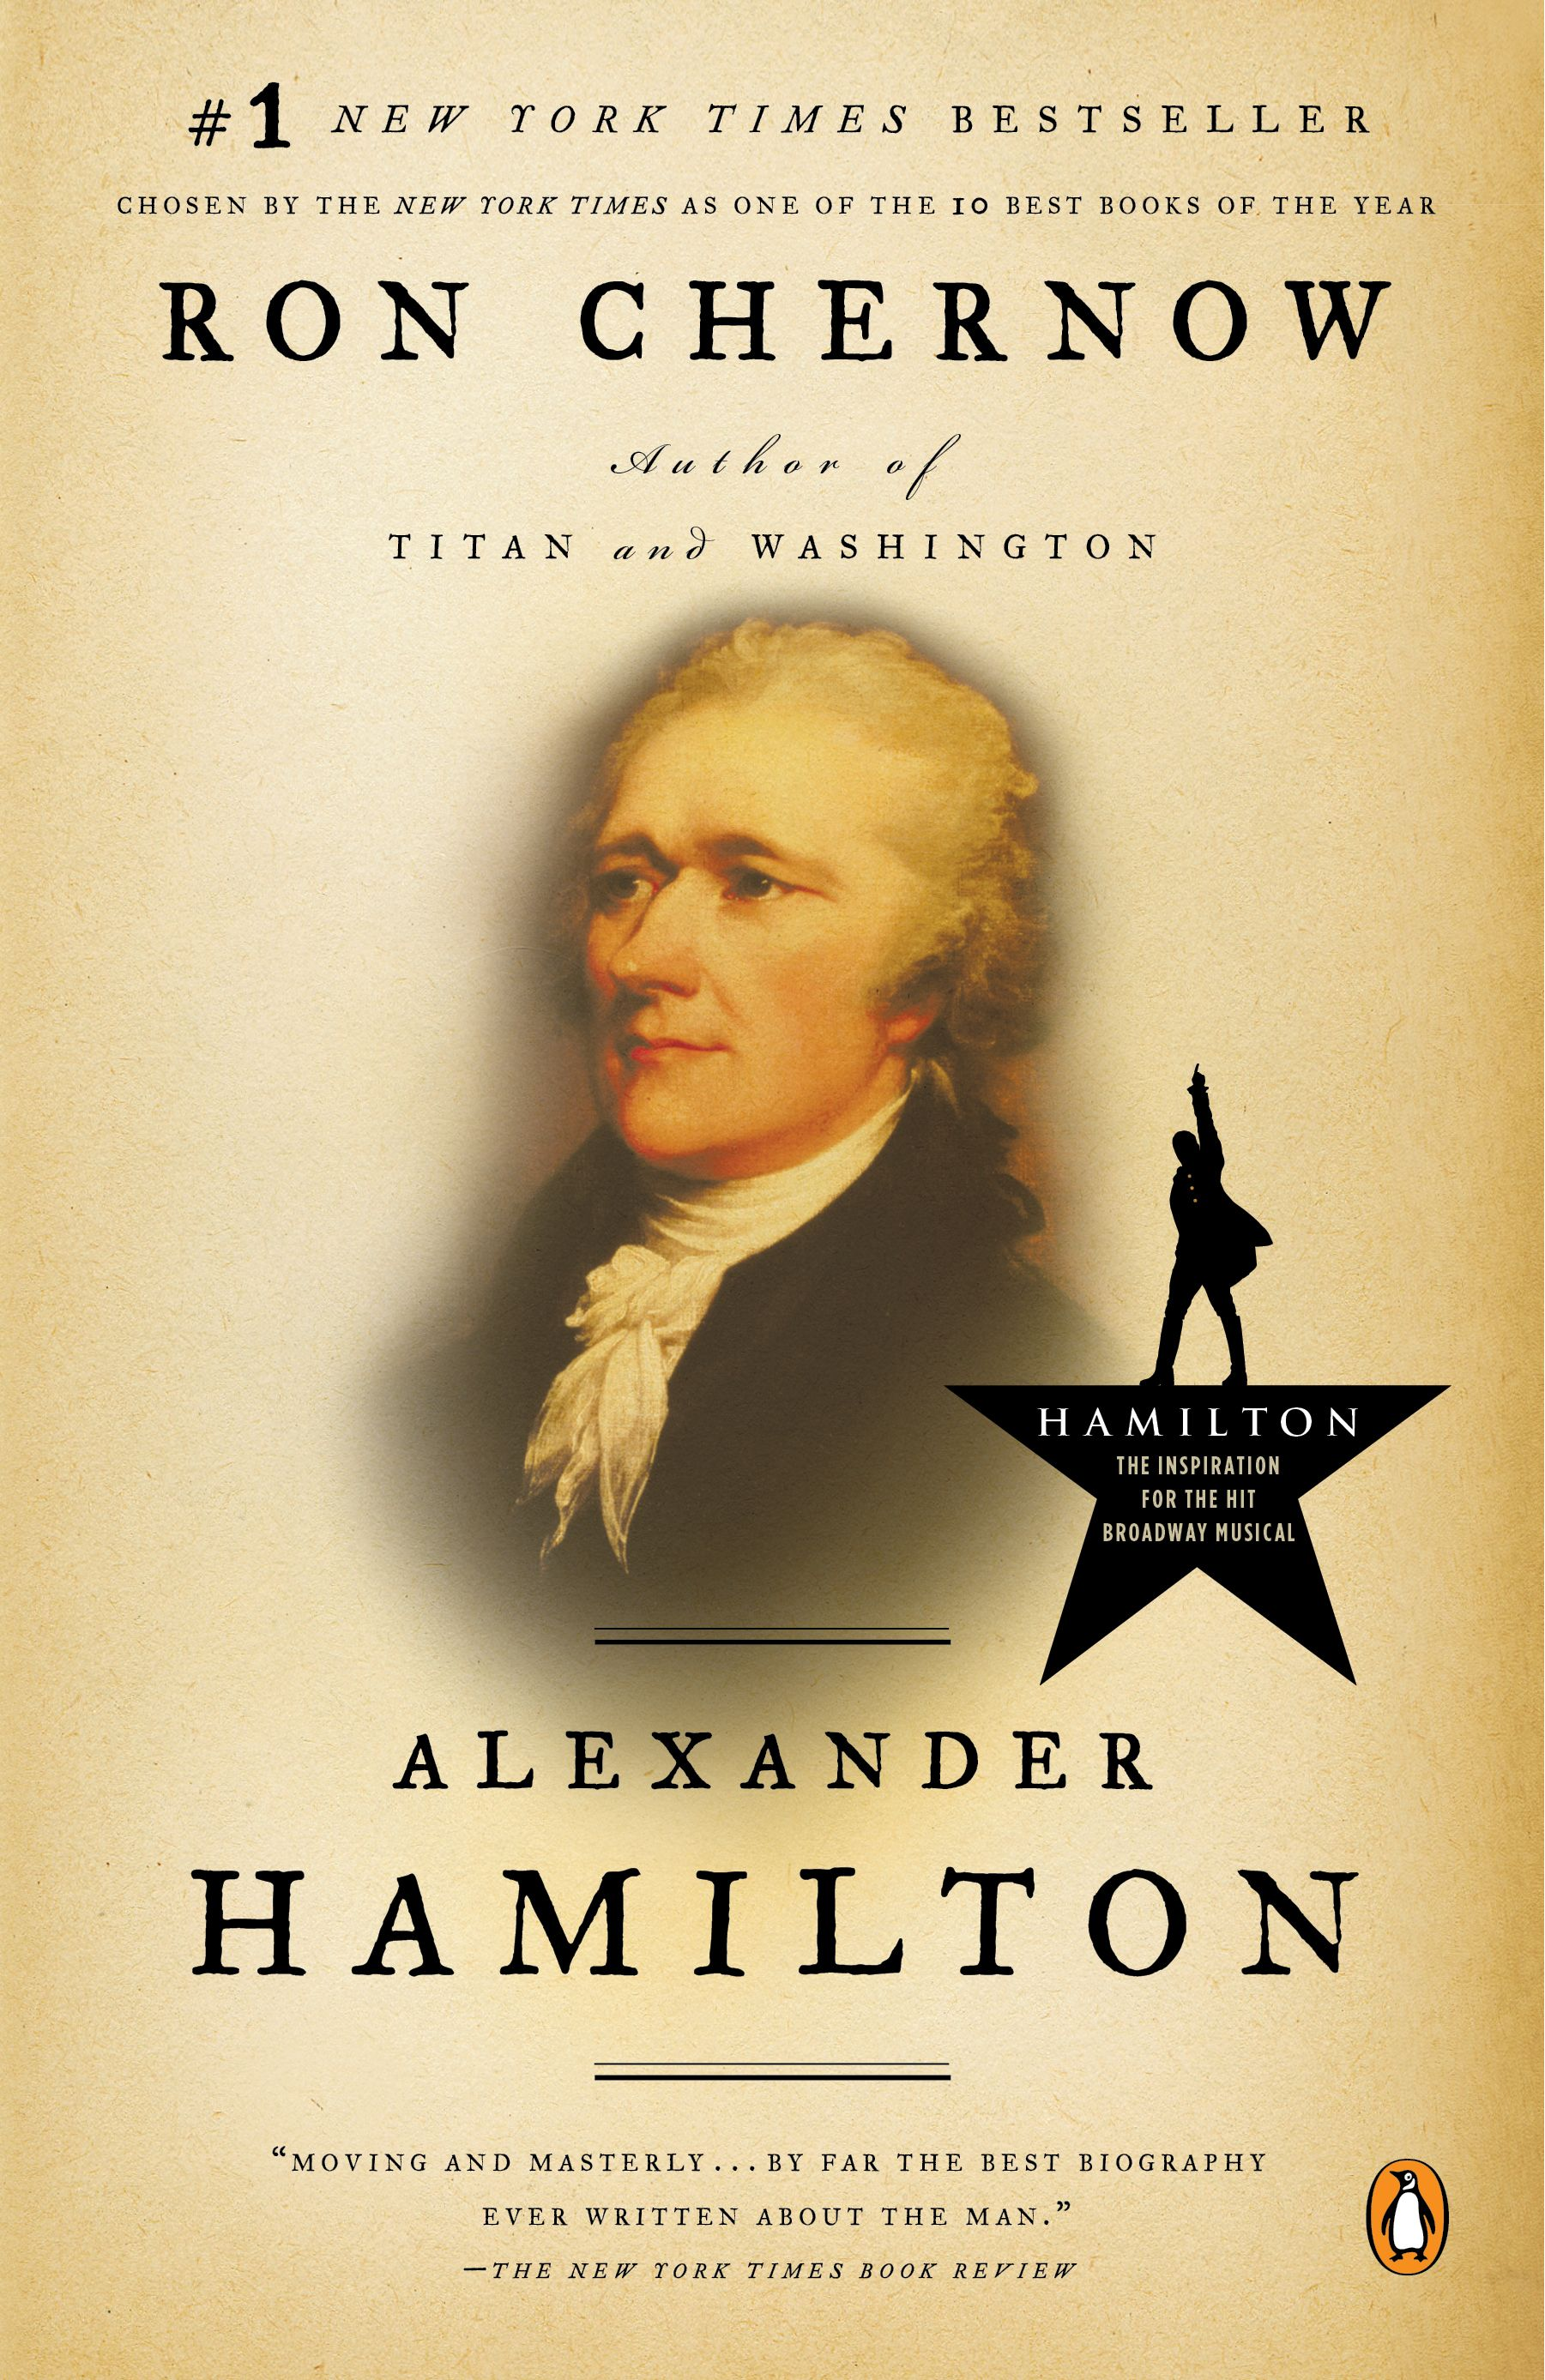 Ron Chernow - Alexander Hamilton